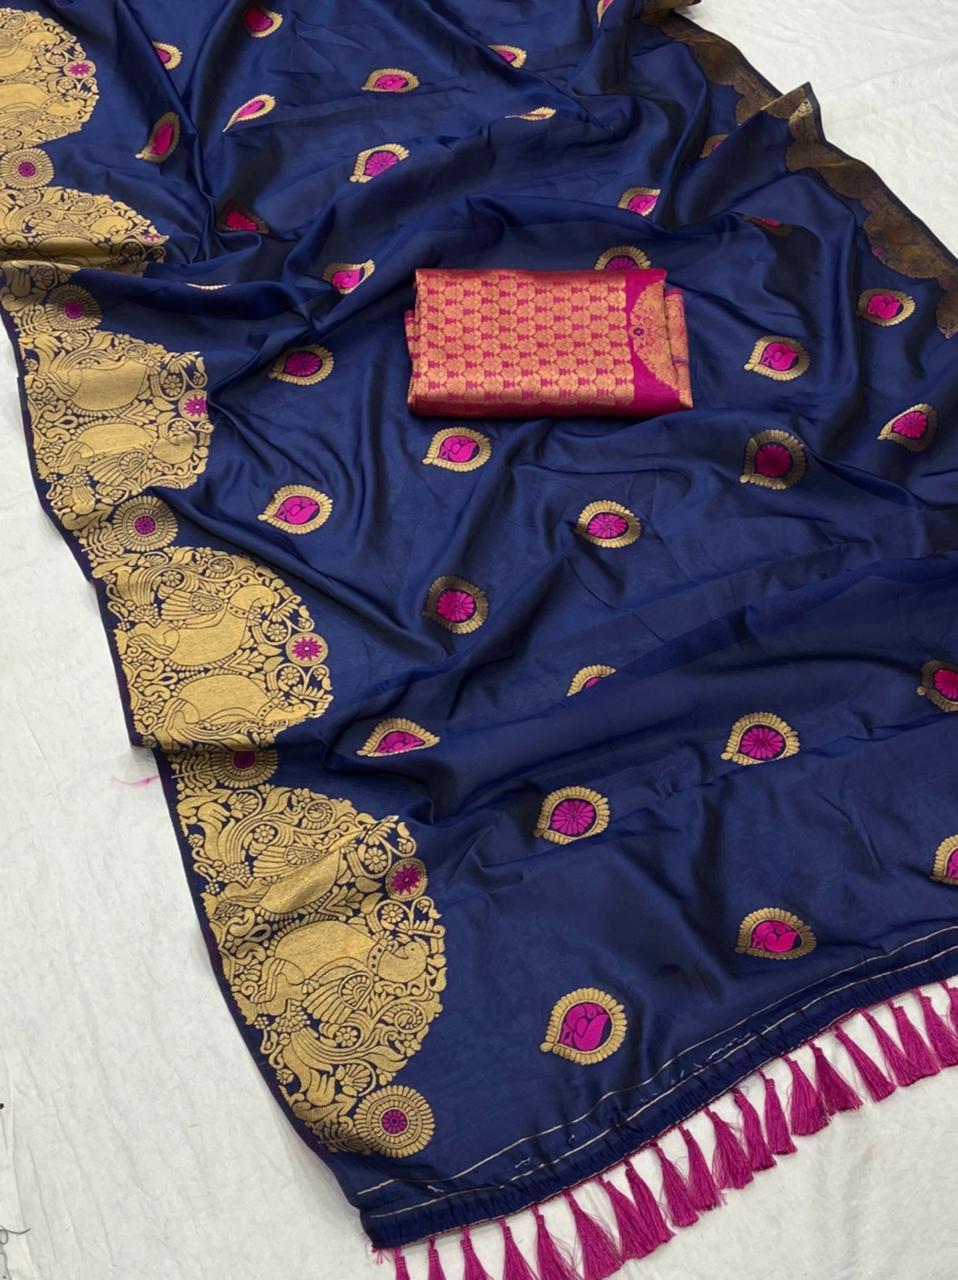 Blue Soft banarsari Silk Saree With weaving gold zari dvz0001974